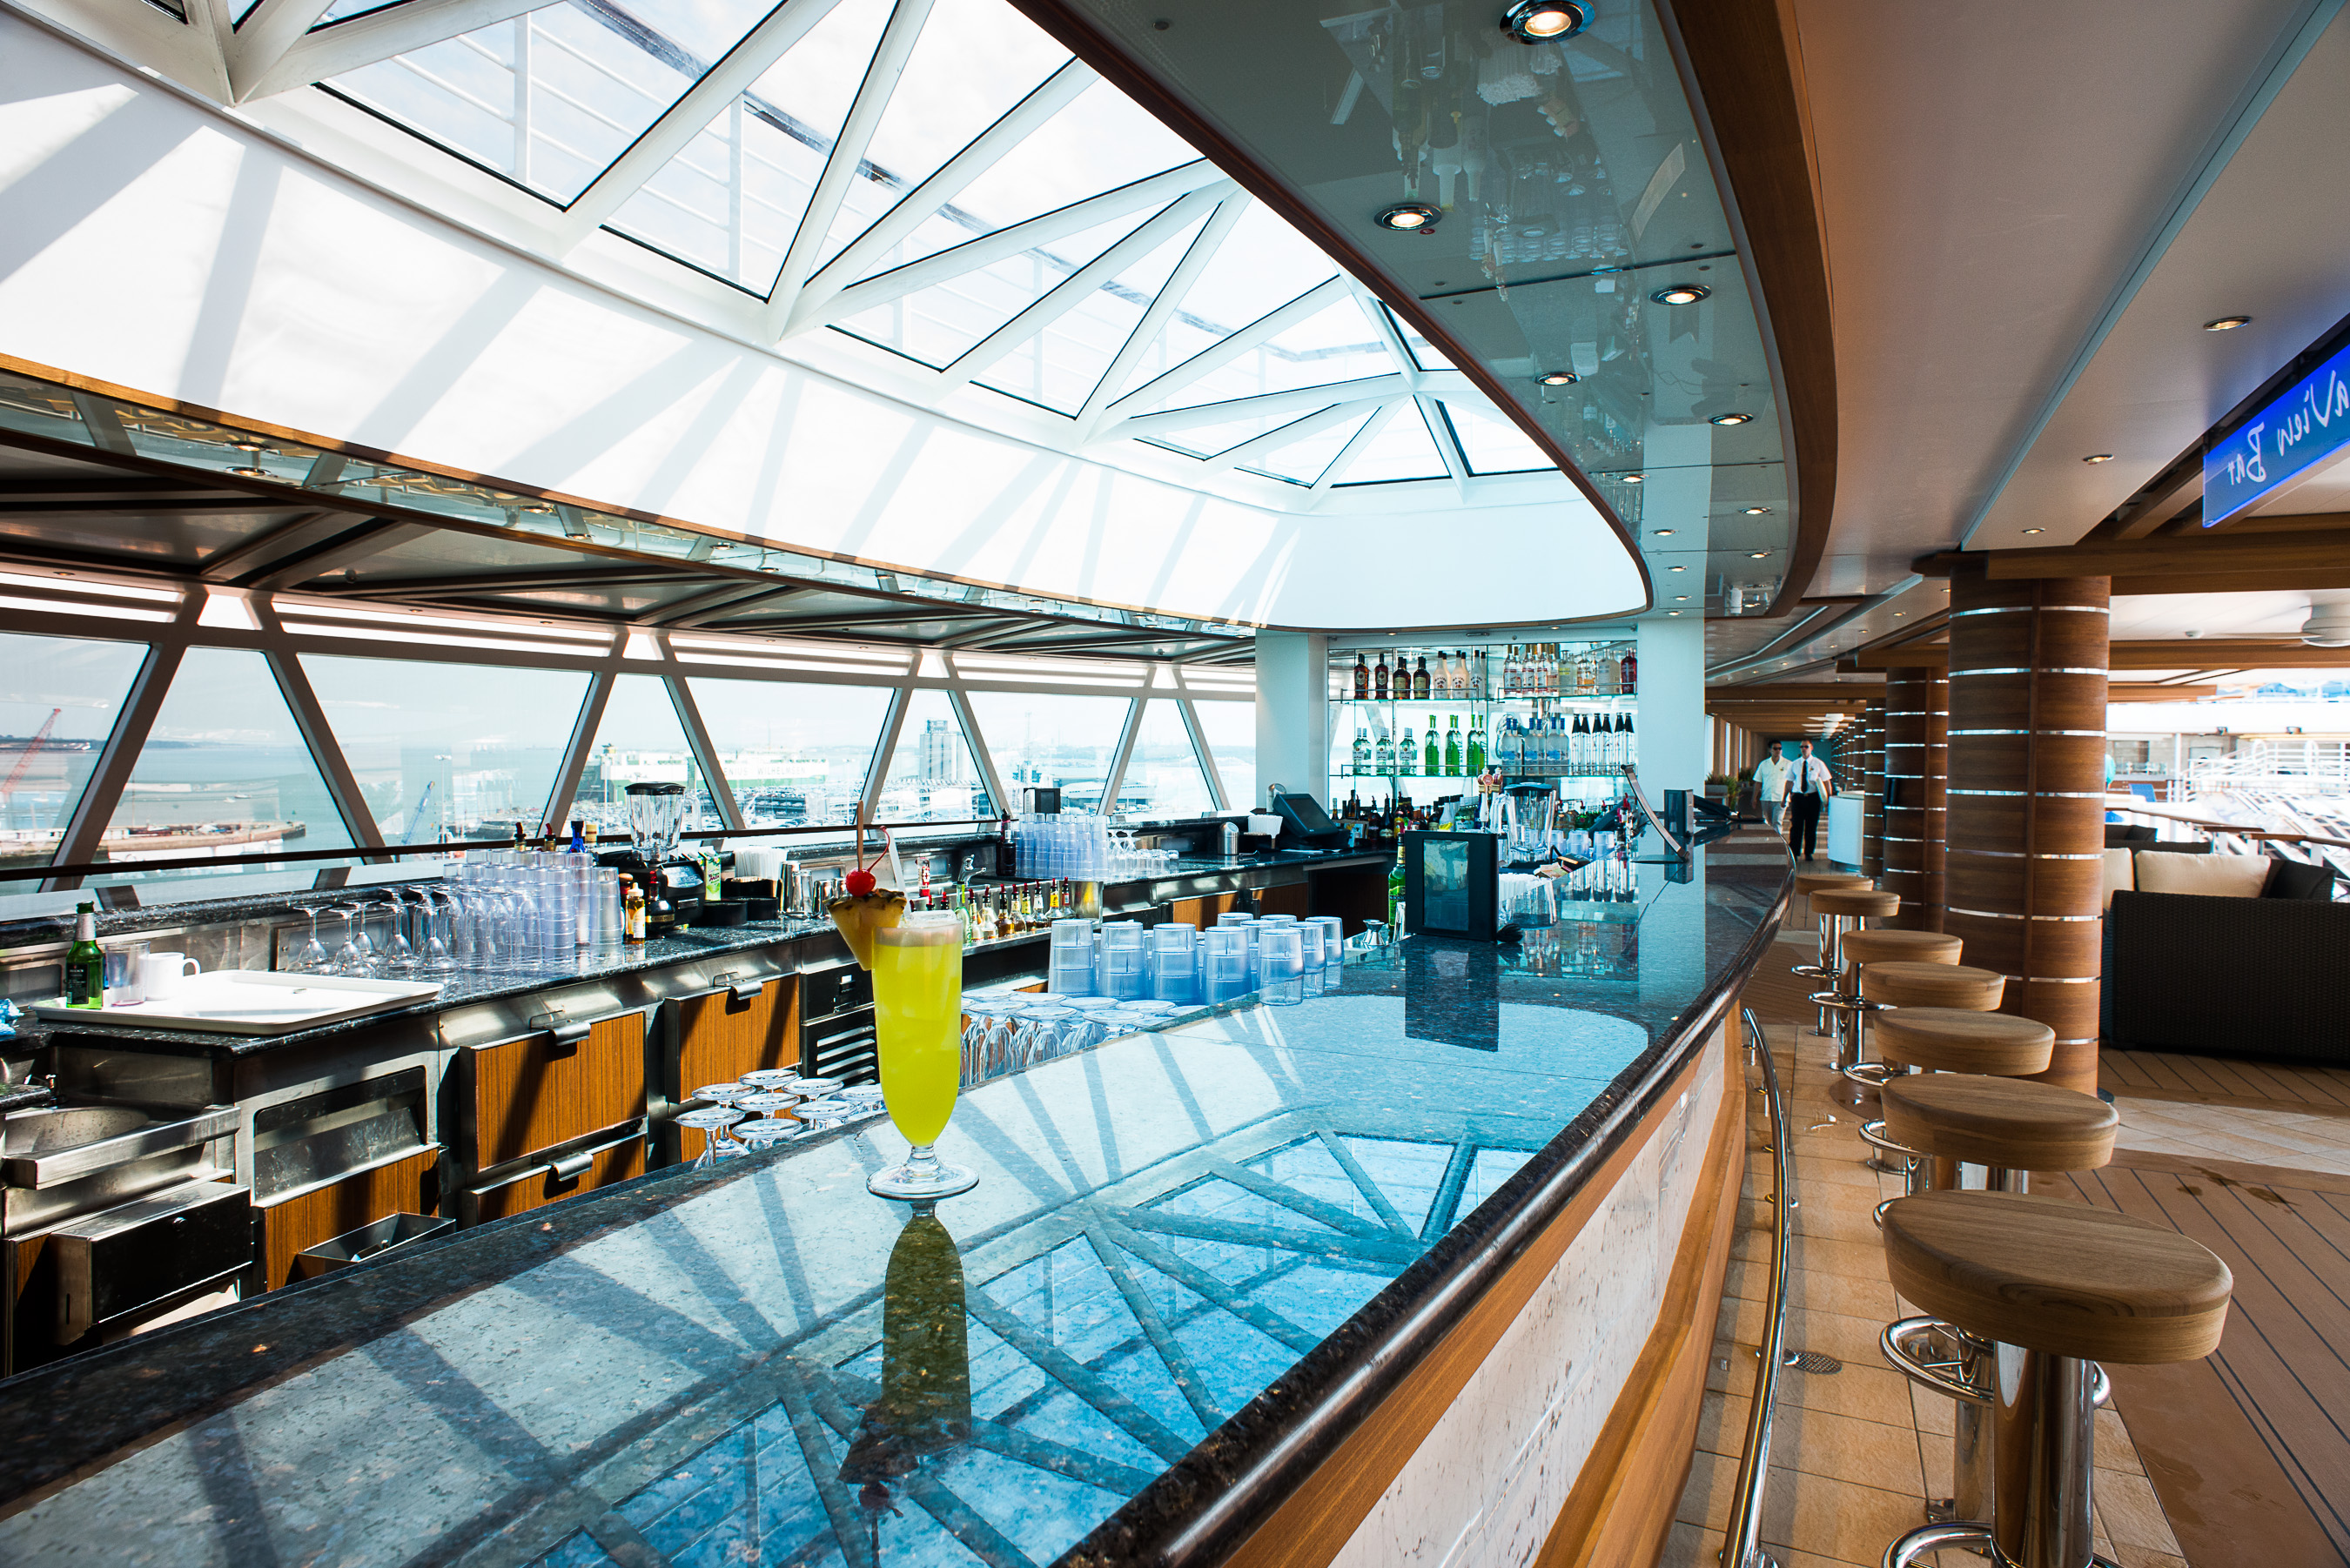 Princess Cruises Royal Class Seaview bar.jpg